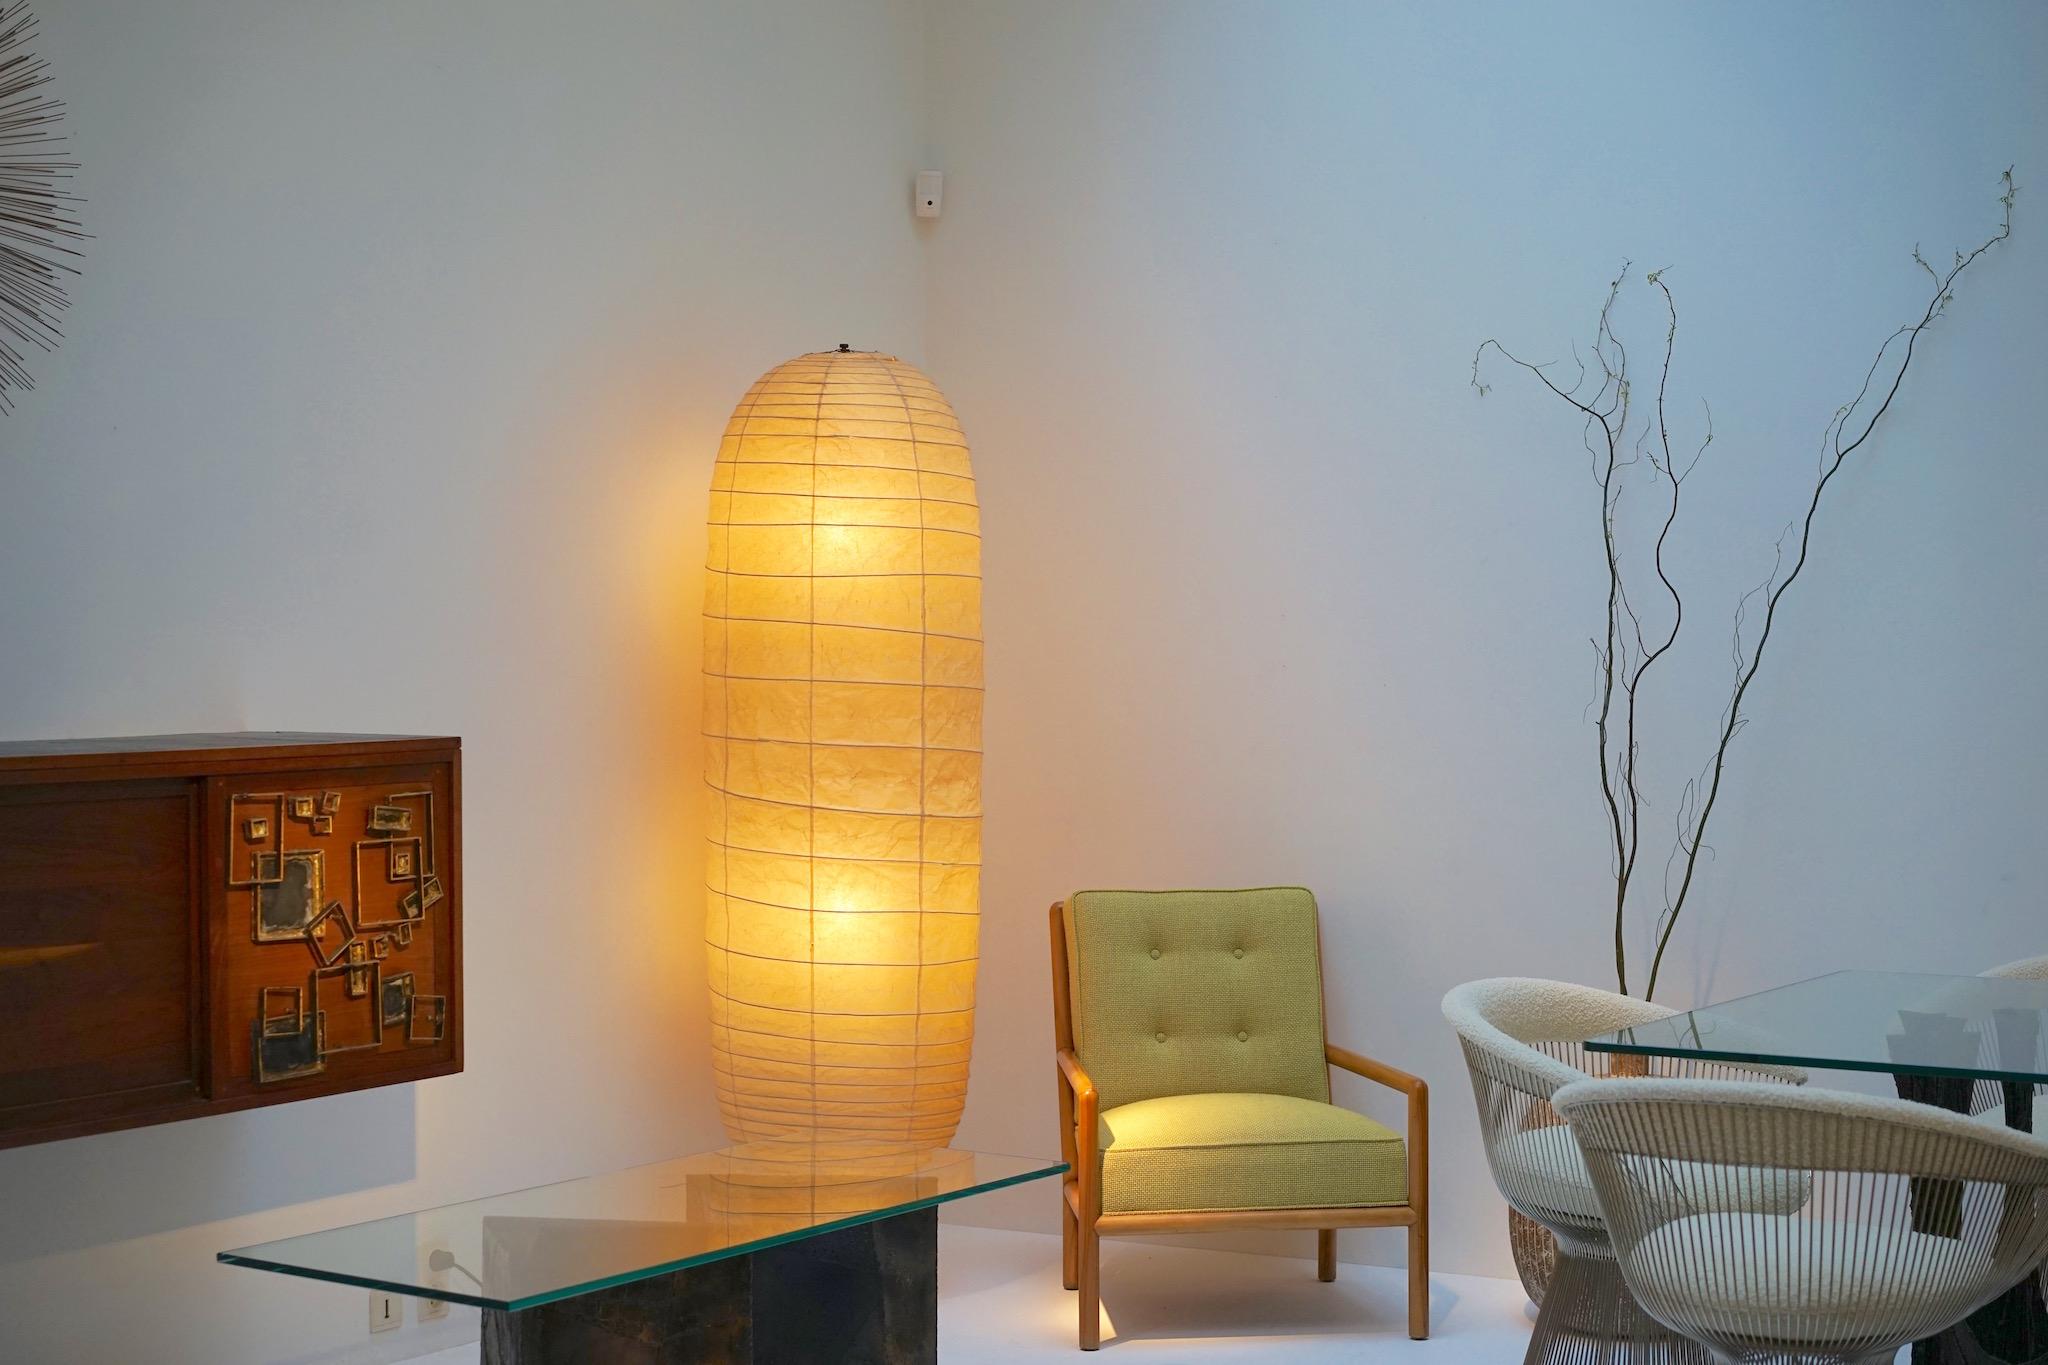 expo-american-masters-design-1950-70-galerie-alexandre-guillemain-10.jpg - Meuble Sejour Design 2/2016 10 14t00:24:17z